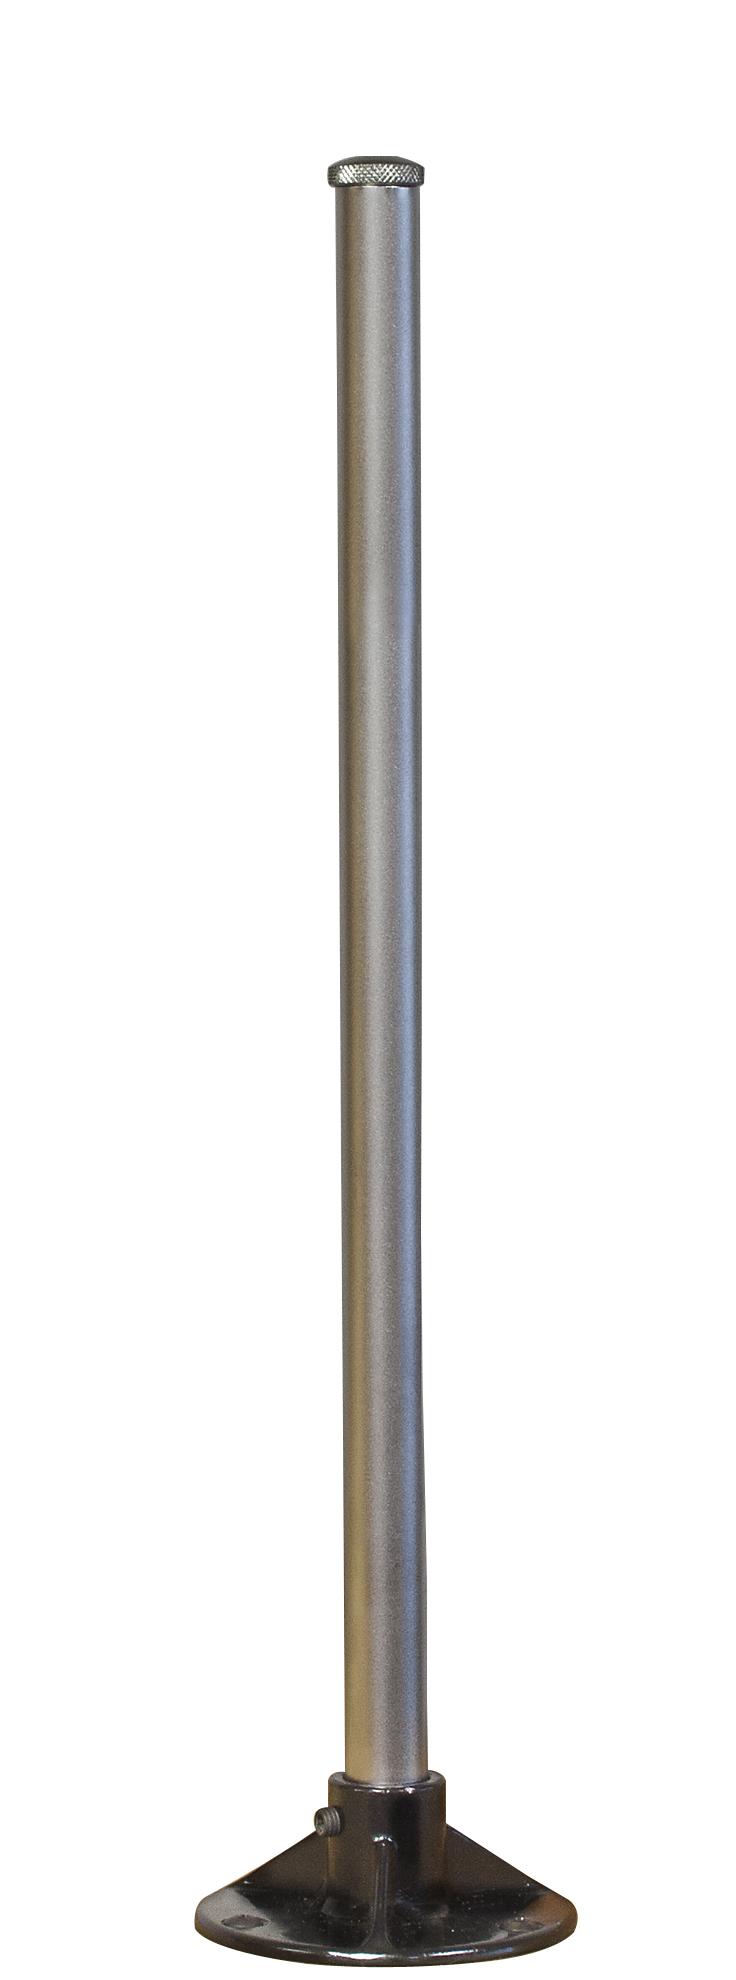 Stativ kurz 43 cm